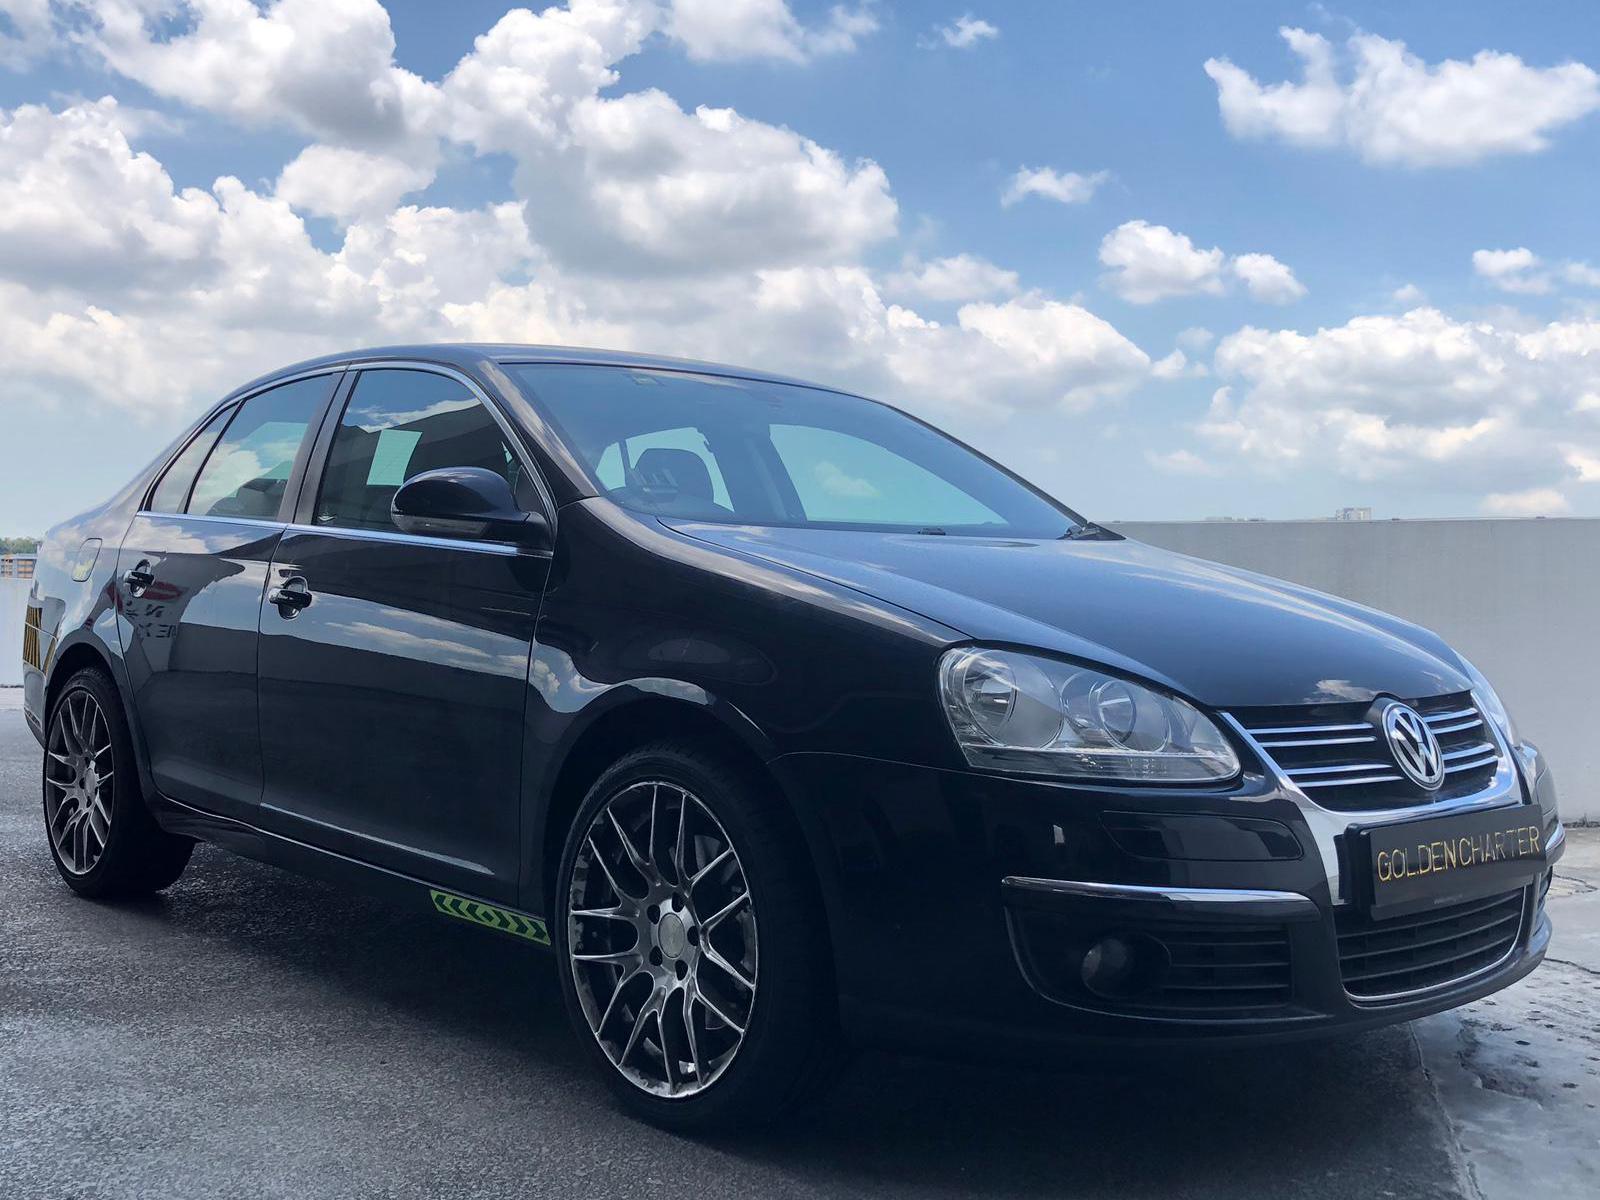 Volkswagen Jetta 1.4A (PHV Private Hire Rental)